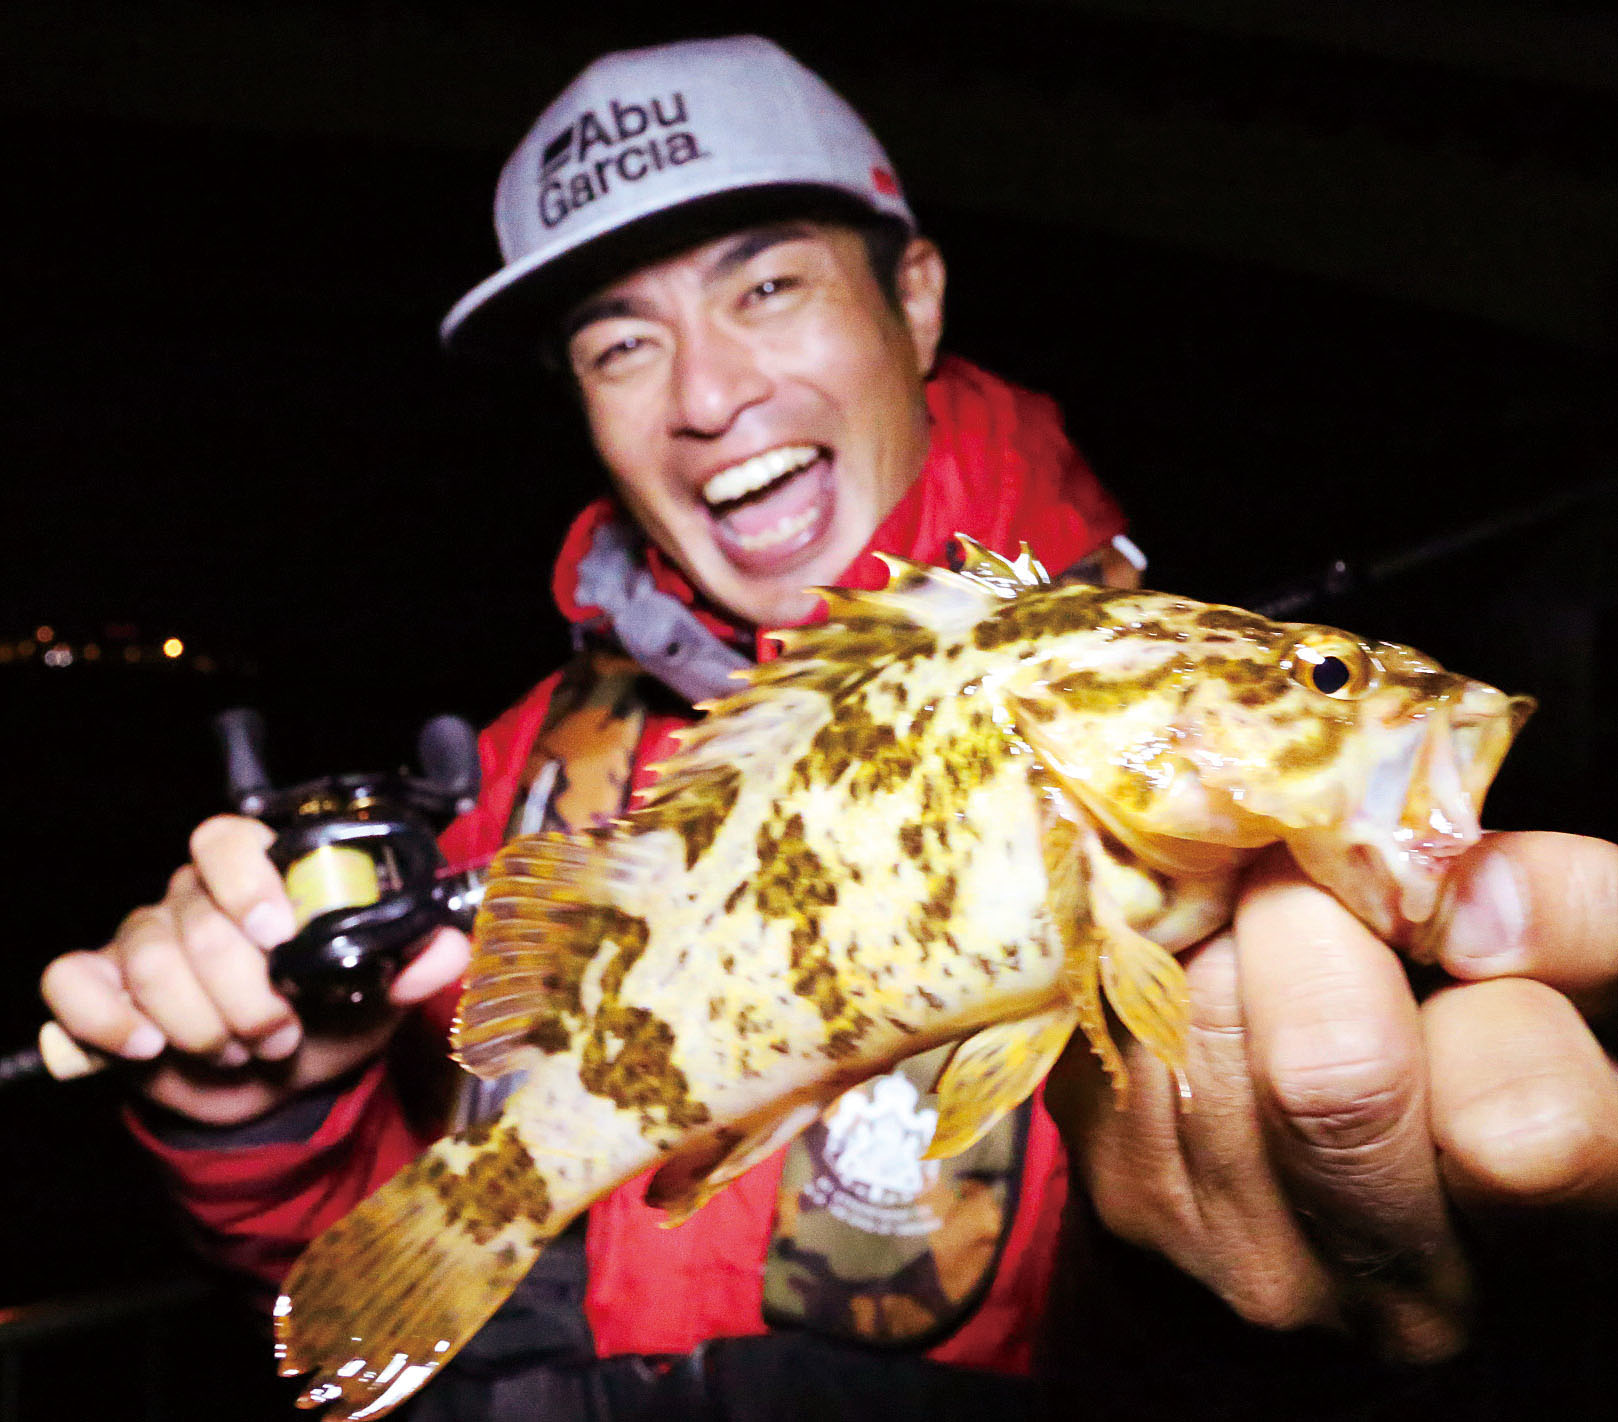 http://lurenews.tv/lightrocl02_tomoshimizu.jpg